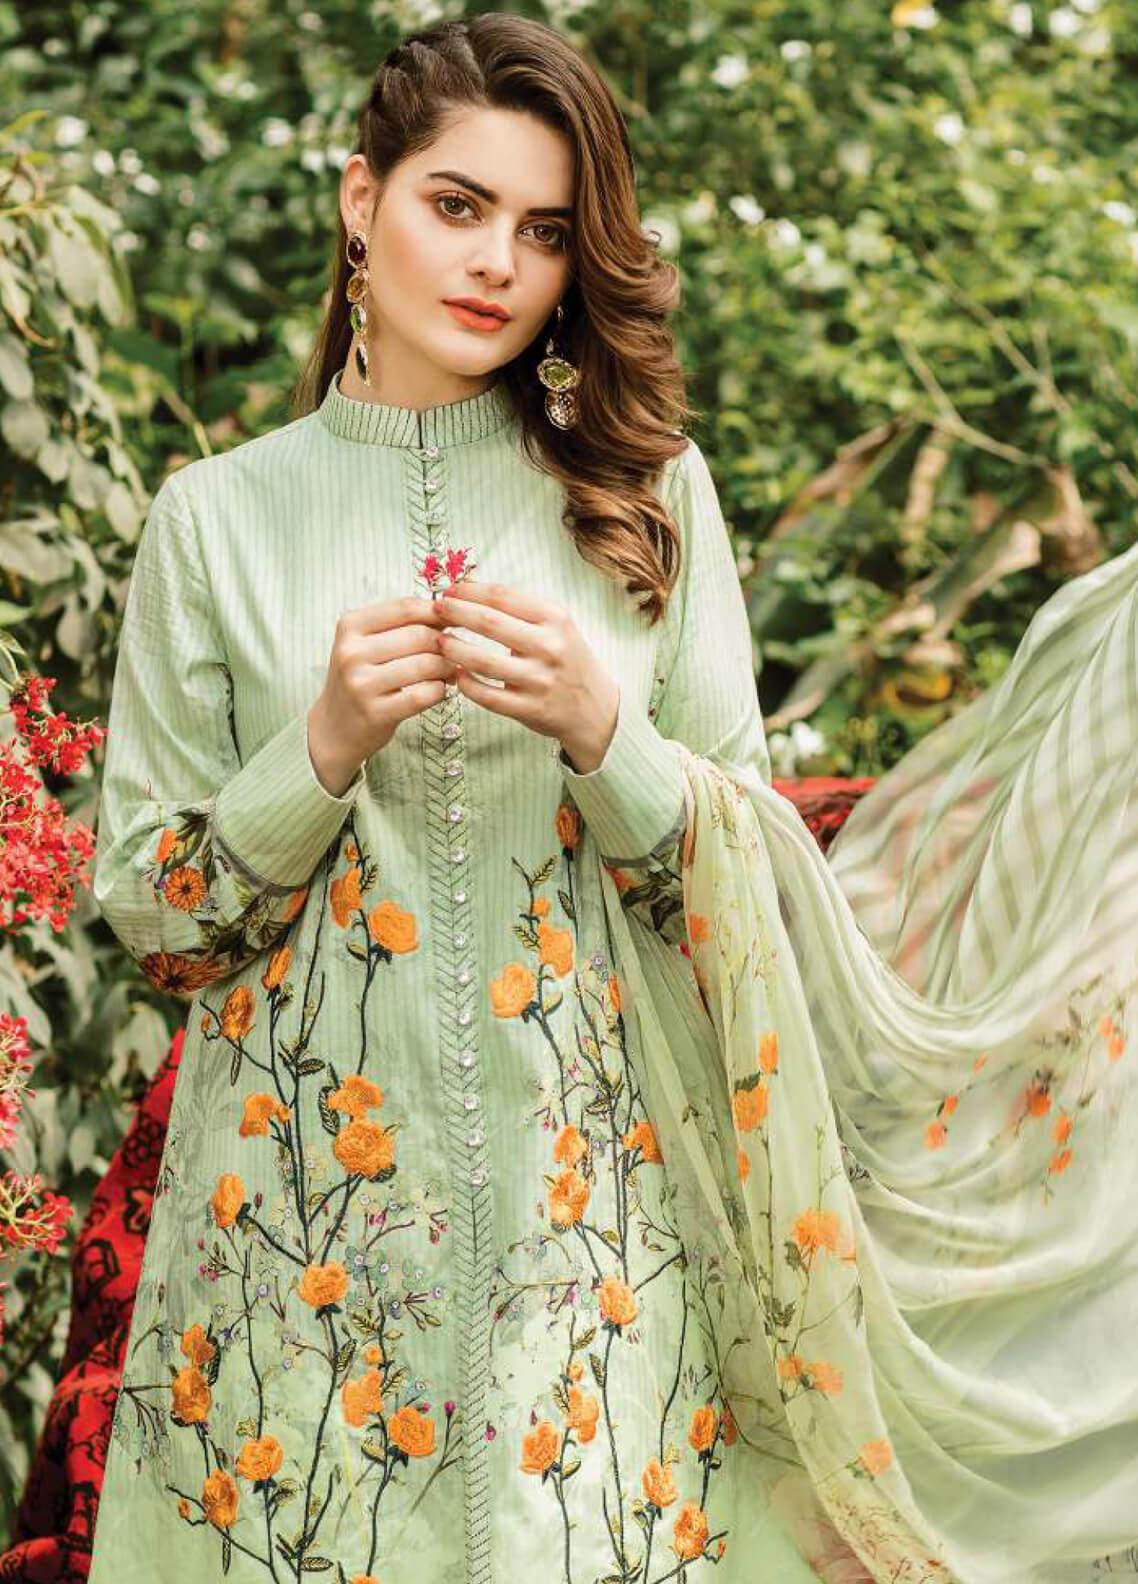 Serene Premium Embroidered Lawn Unstitched 3 Piece Suit SPM19L 11 PISTA TULIPS - Spring / Summer Collection